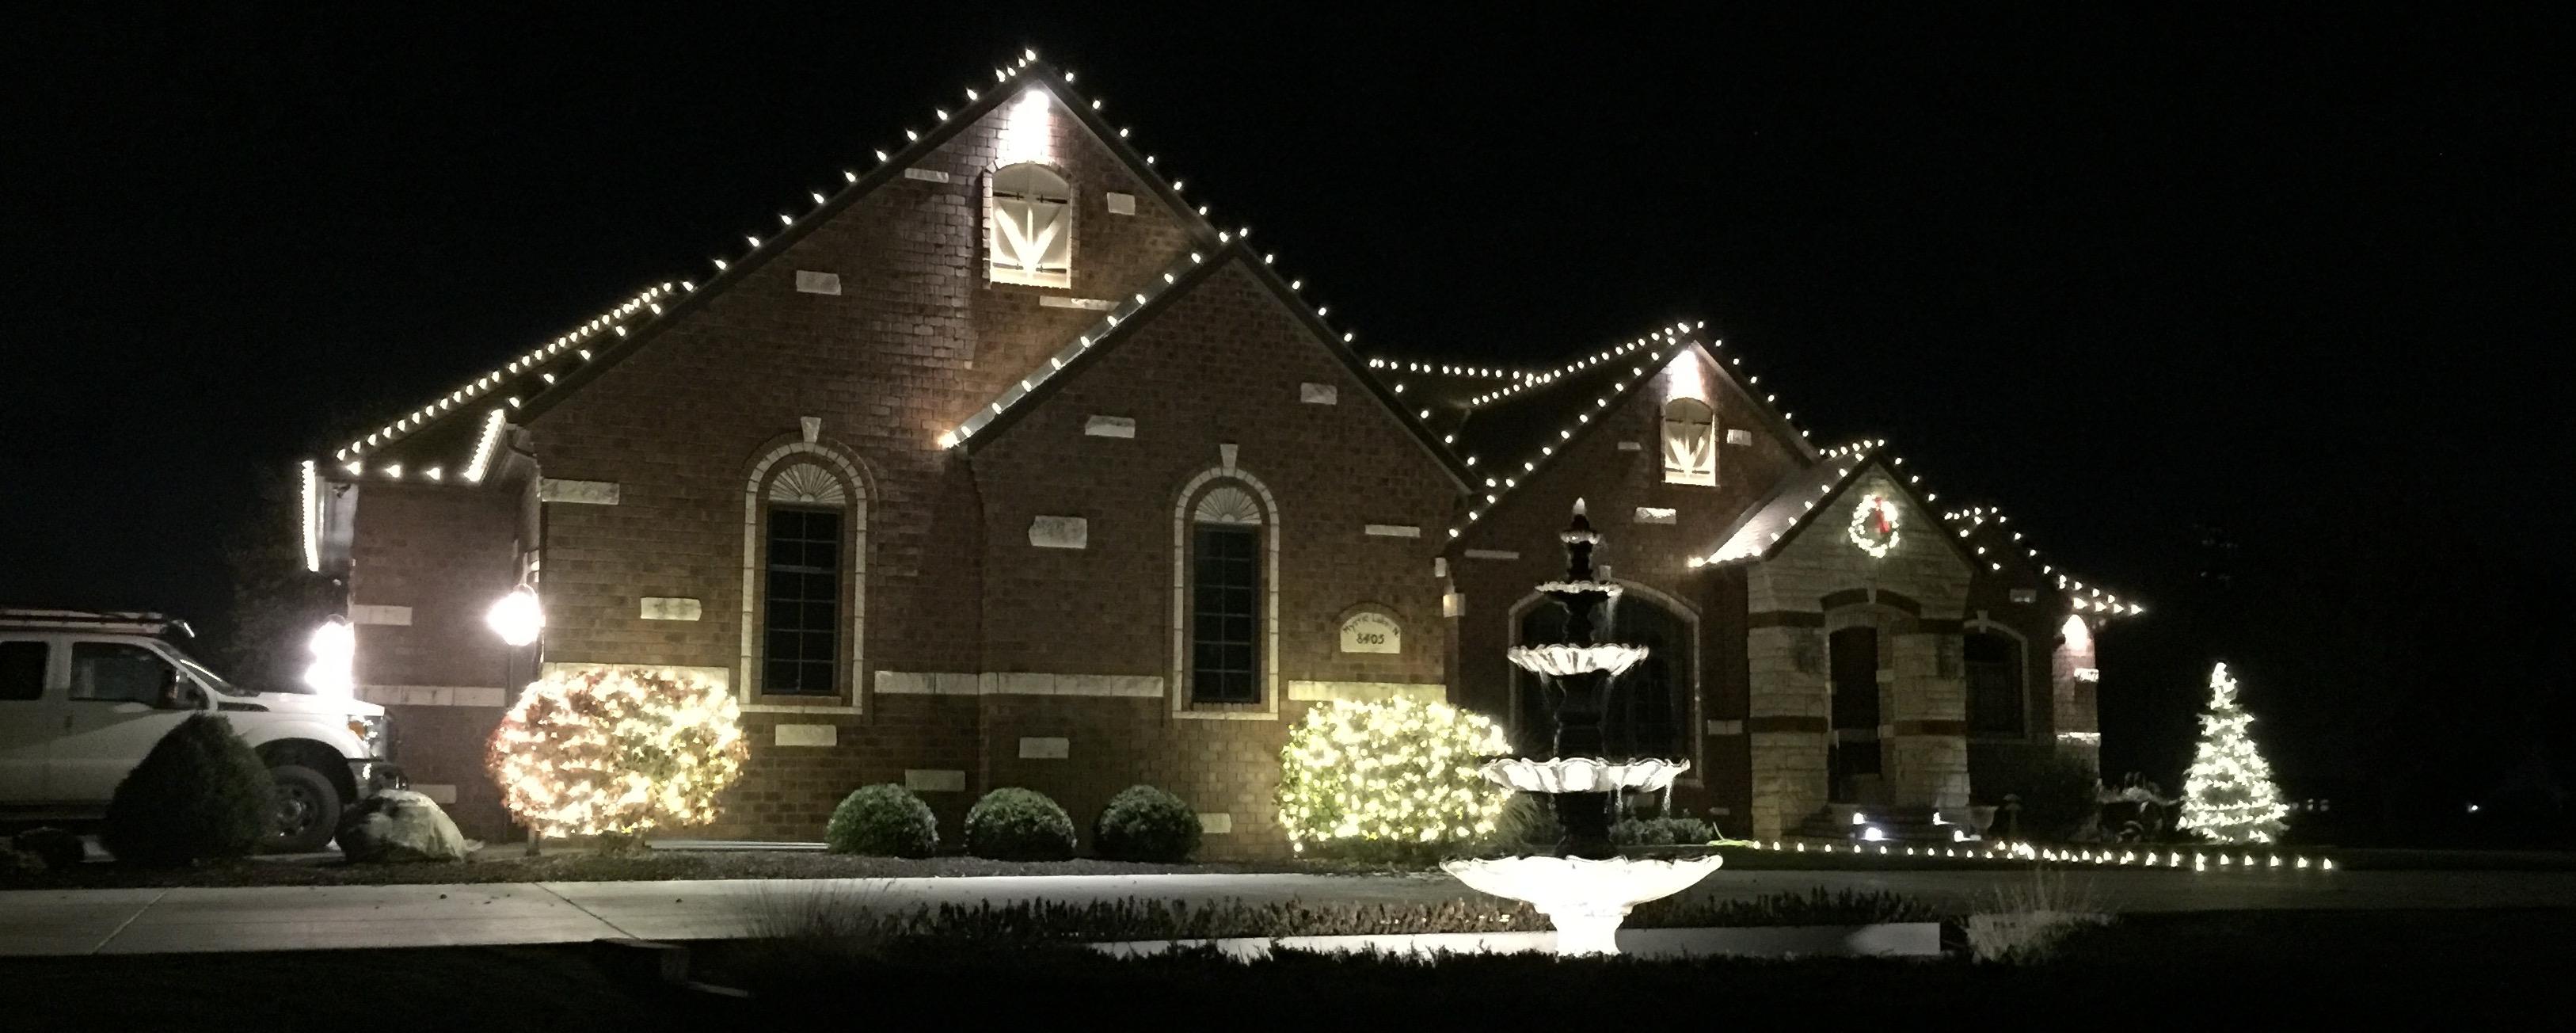 Christmas Lights In Wichita Ks.Best Residential Christmas Light Installers In Wichita